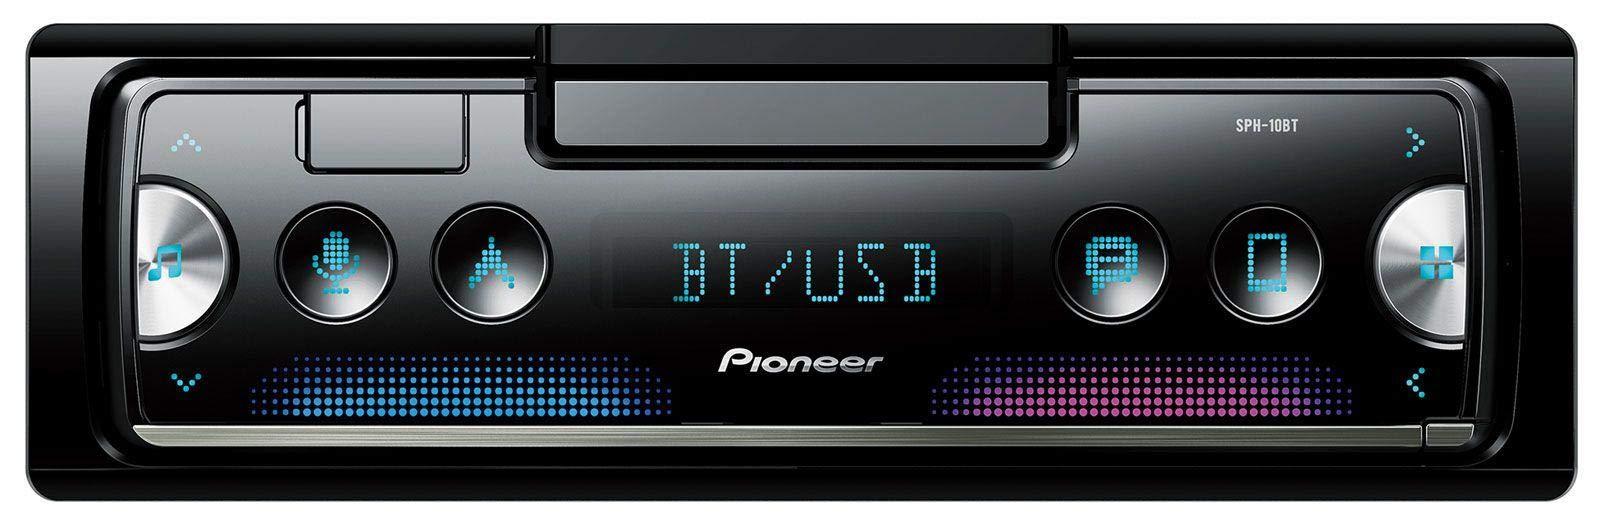 caraudio24-Pioneer-SPH-10BT-MP3-AUX-Bluetooth-USB-Autoradio-fr-Mercedes-C-Klasse-W203-CLK-W209-Vito-Viano-G